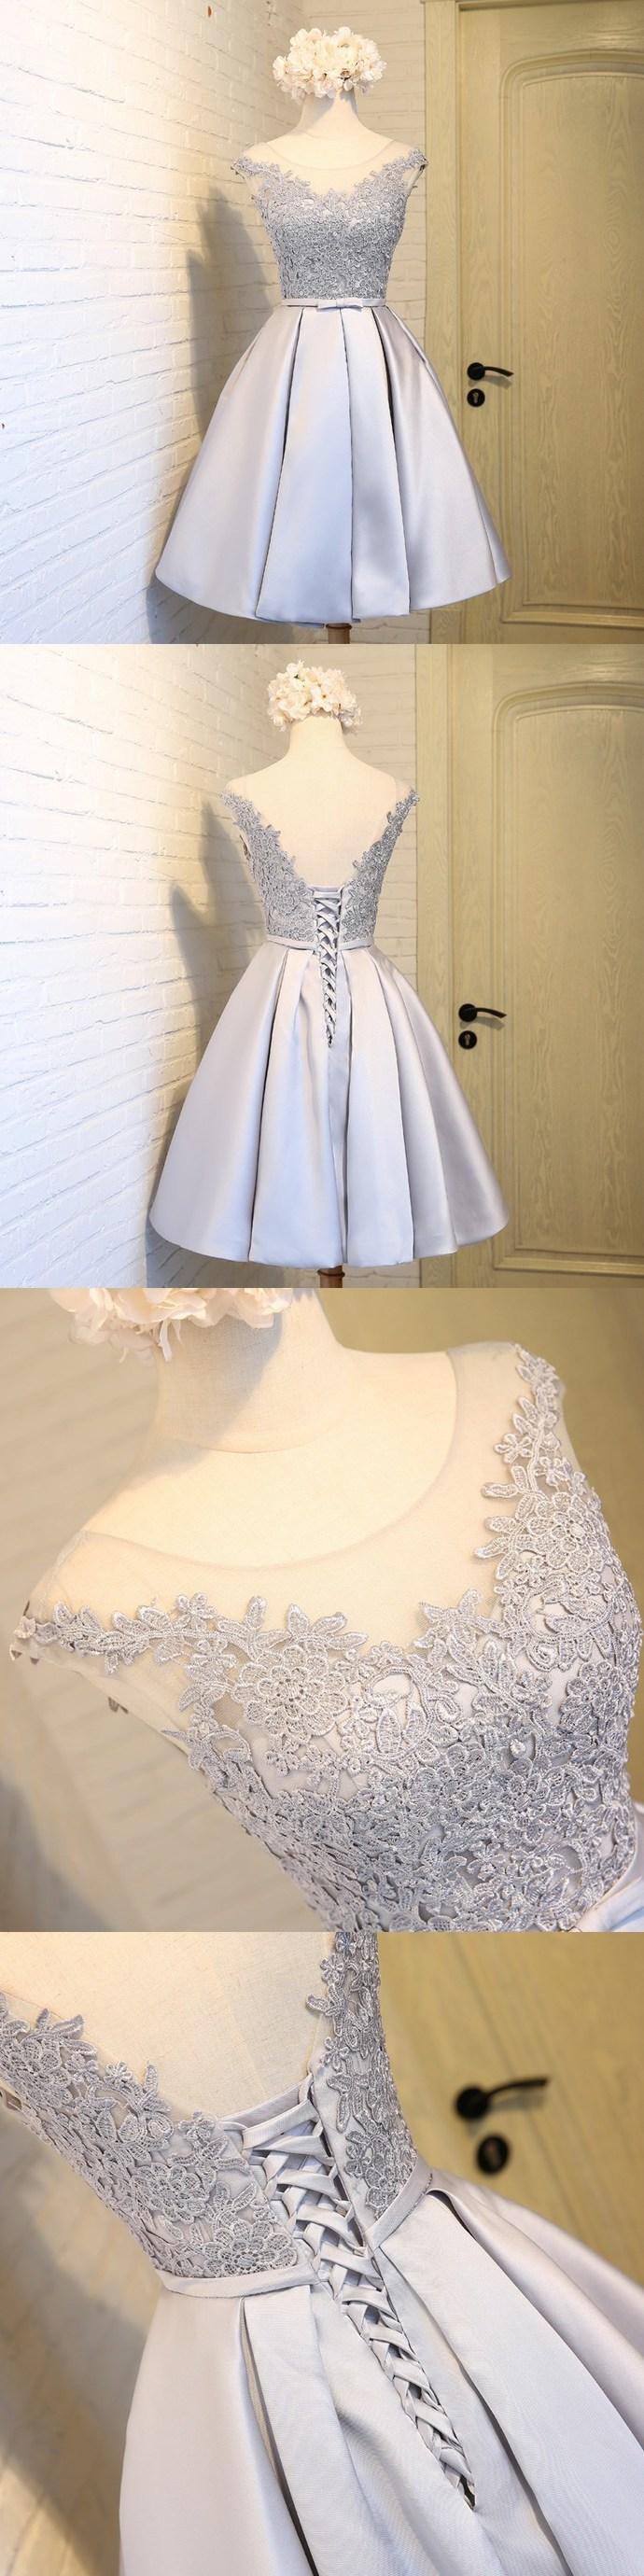 Lace Appliqued Homecoming Dresses, Satin Short Prom Dresses,2018 Hoco Dresses,